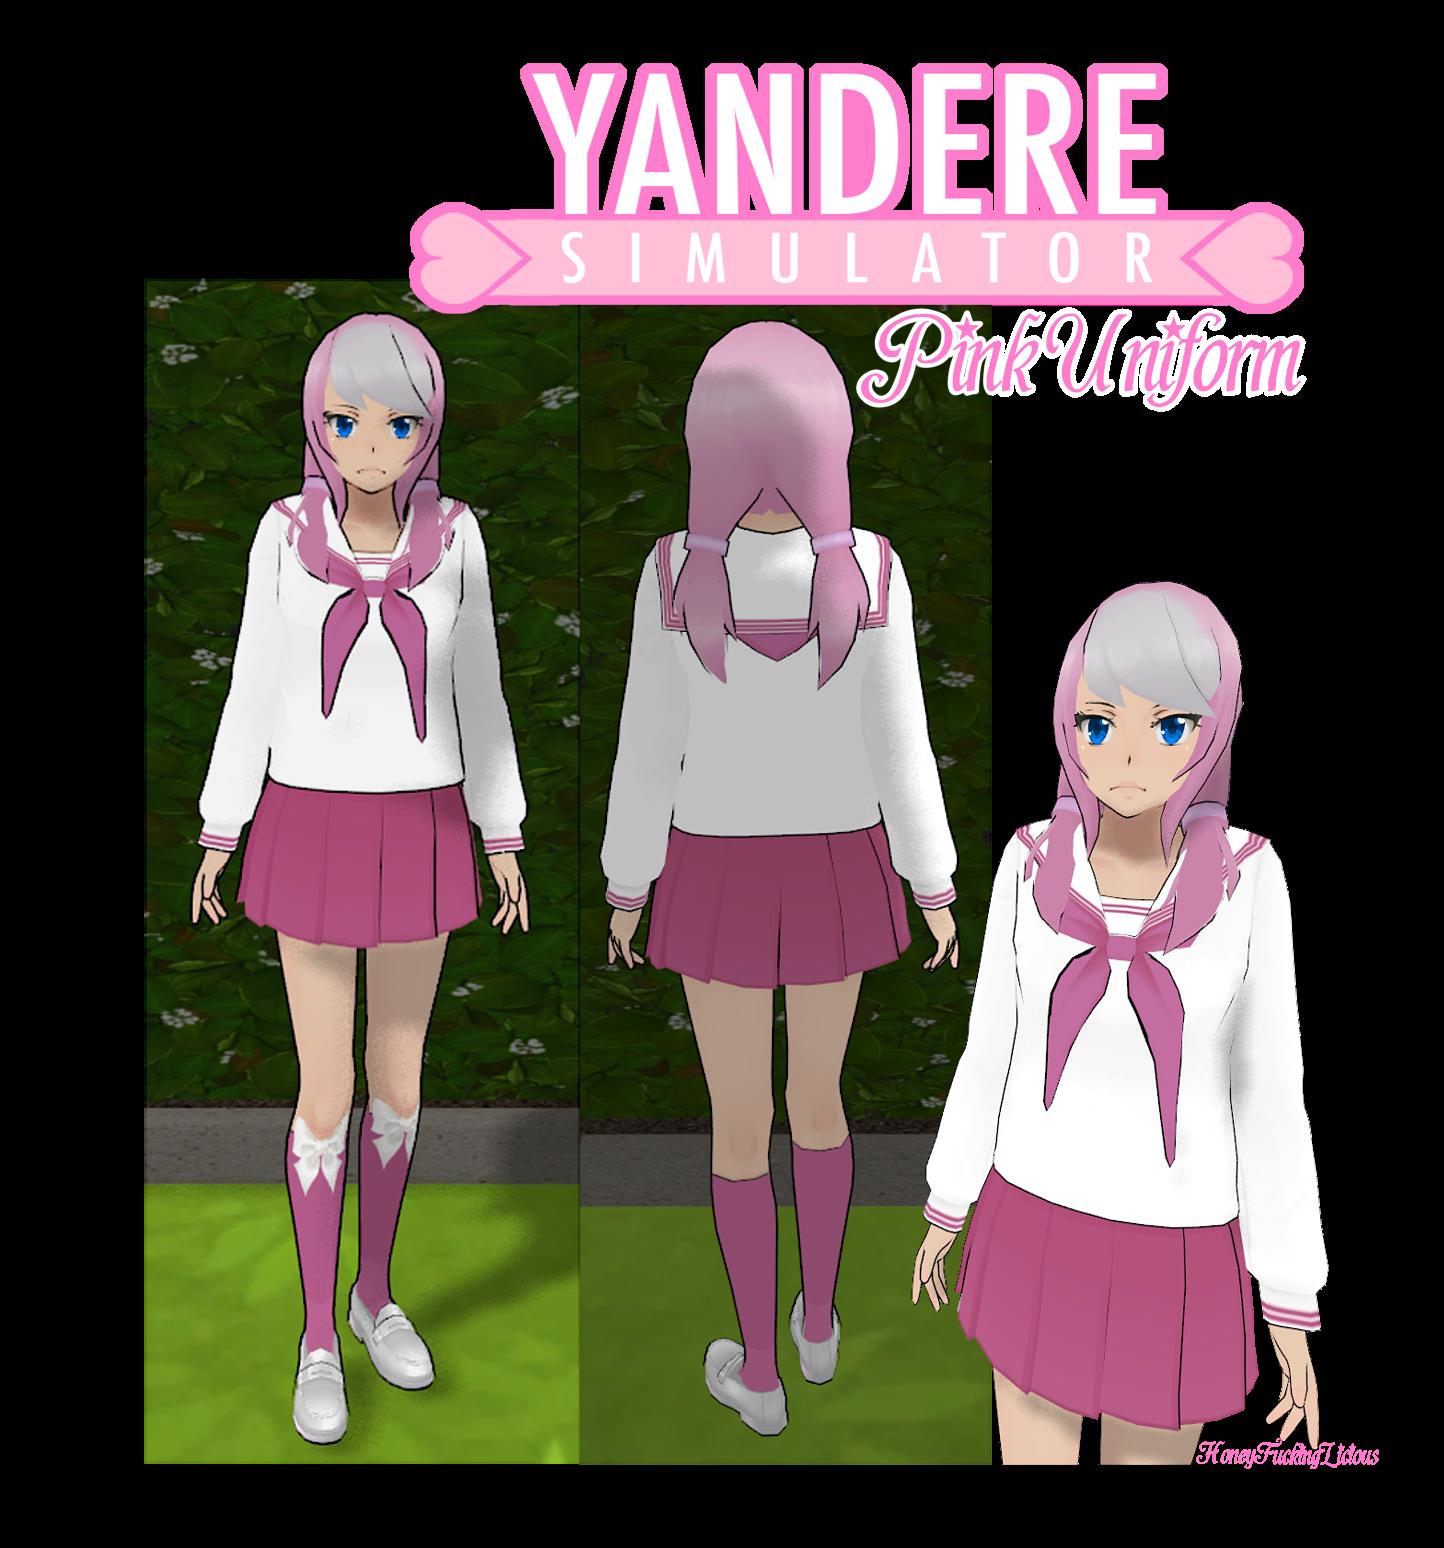 Yandere Simulator Skin: Pink Uniform by HoneyFuckingLicious